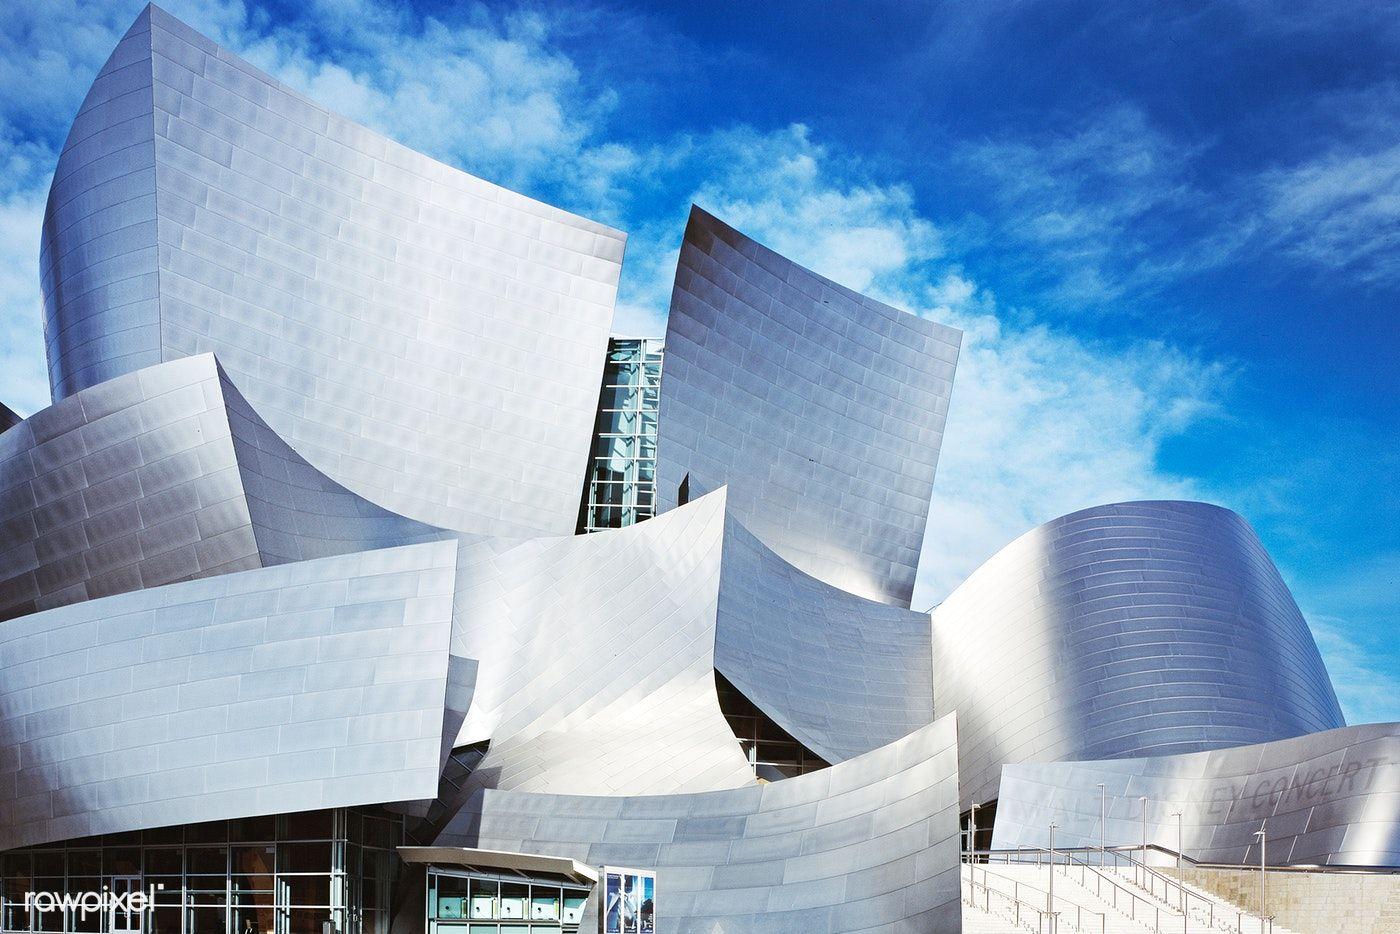 Modernist Architect Frank Gehry S Walt Disney Concert Hall Los Angeles California 2013 Original Im In 2020 Gehry Architecture Frank Gehry Architecture Frank Gehry